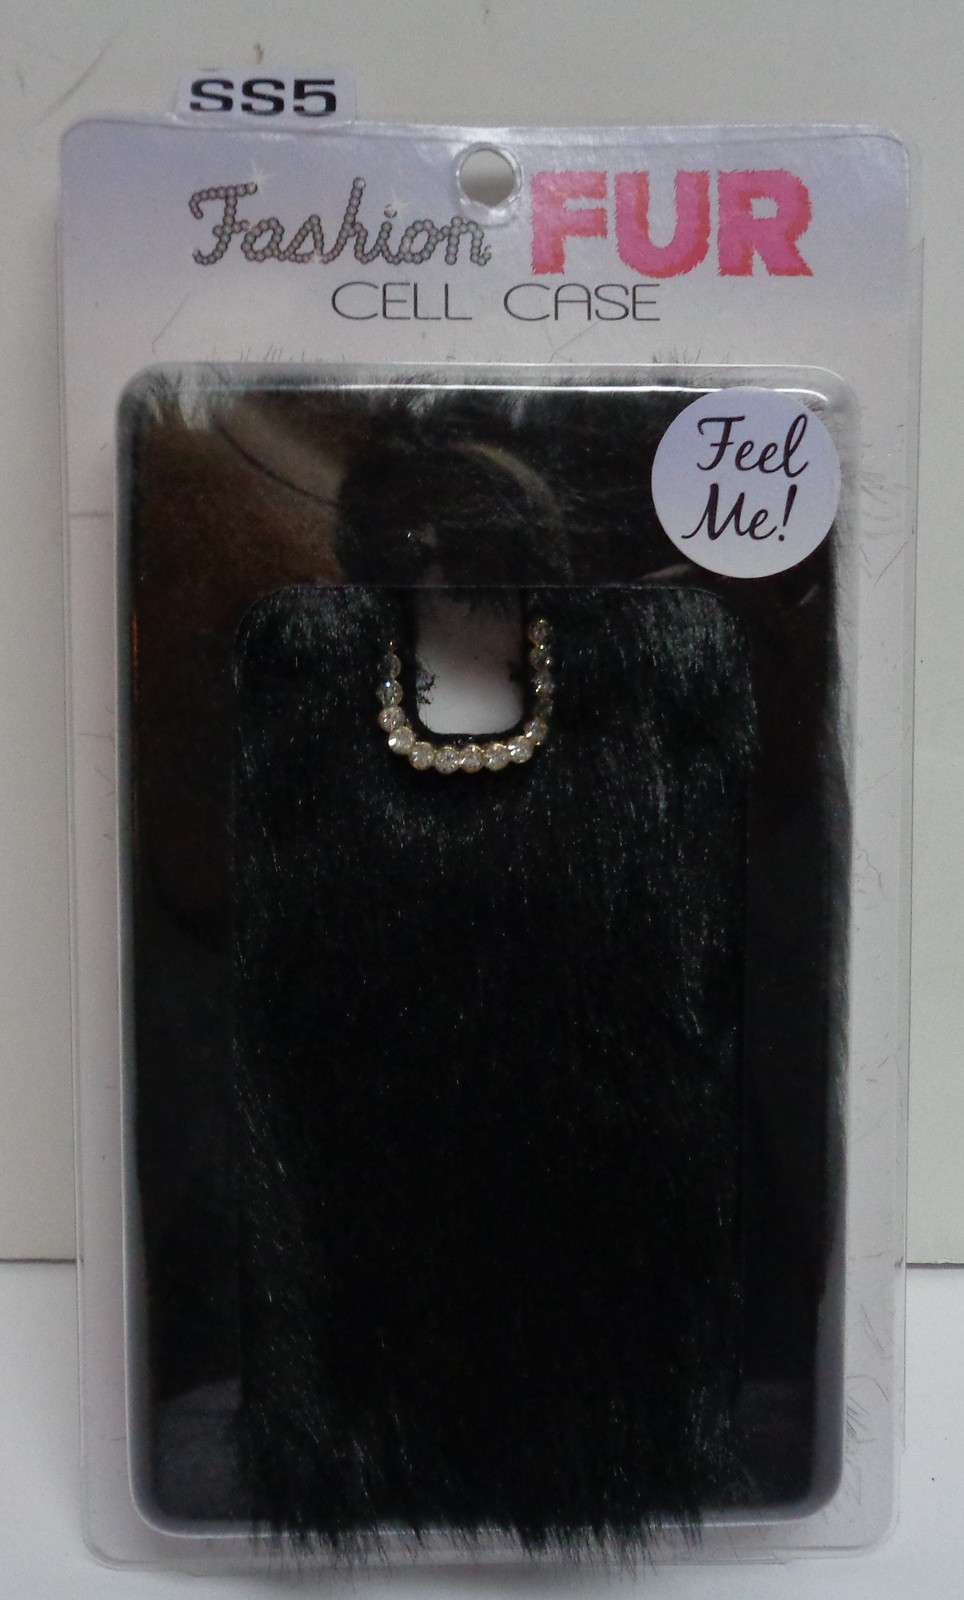 Black Fur SS5 Cell Phone Case NIB Gadget Gear Novelty Fashion